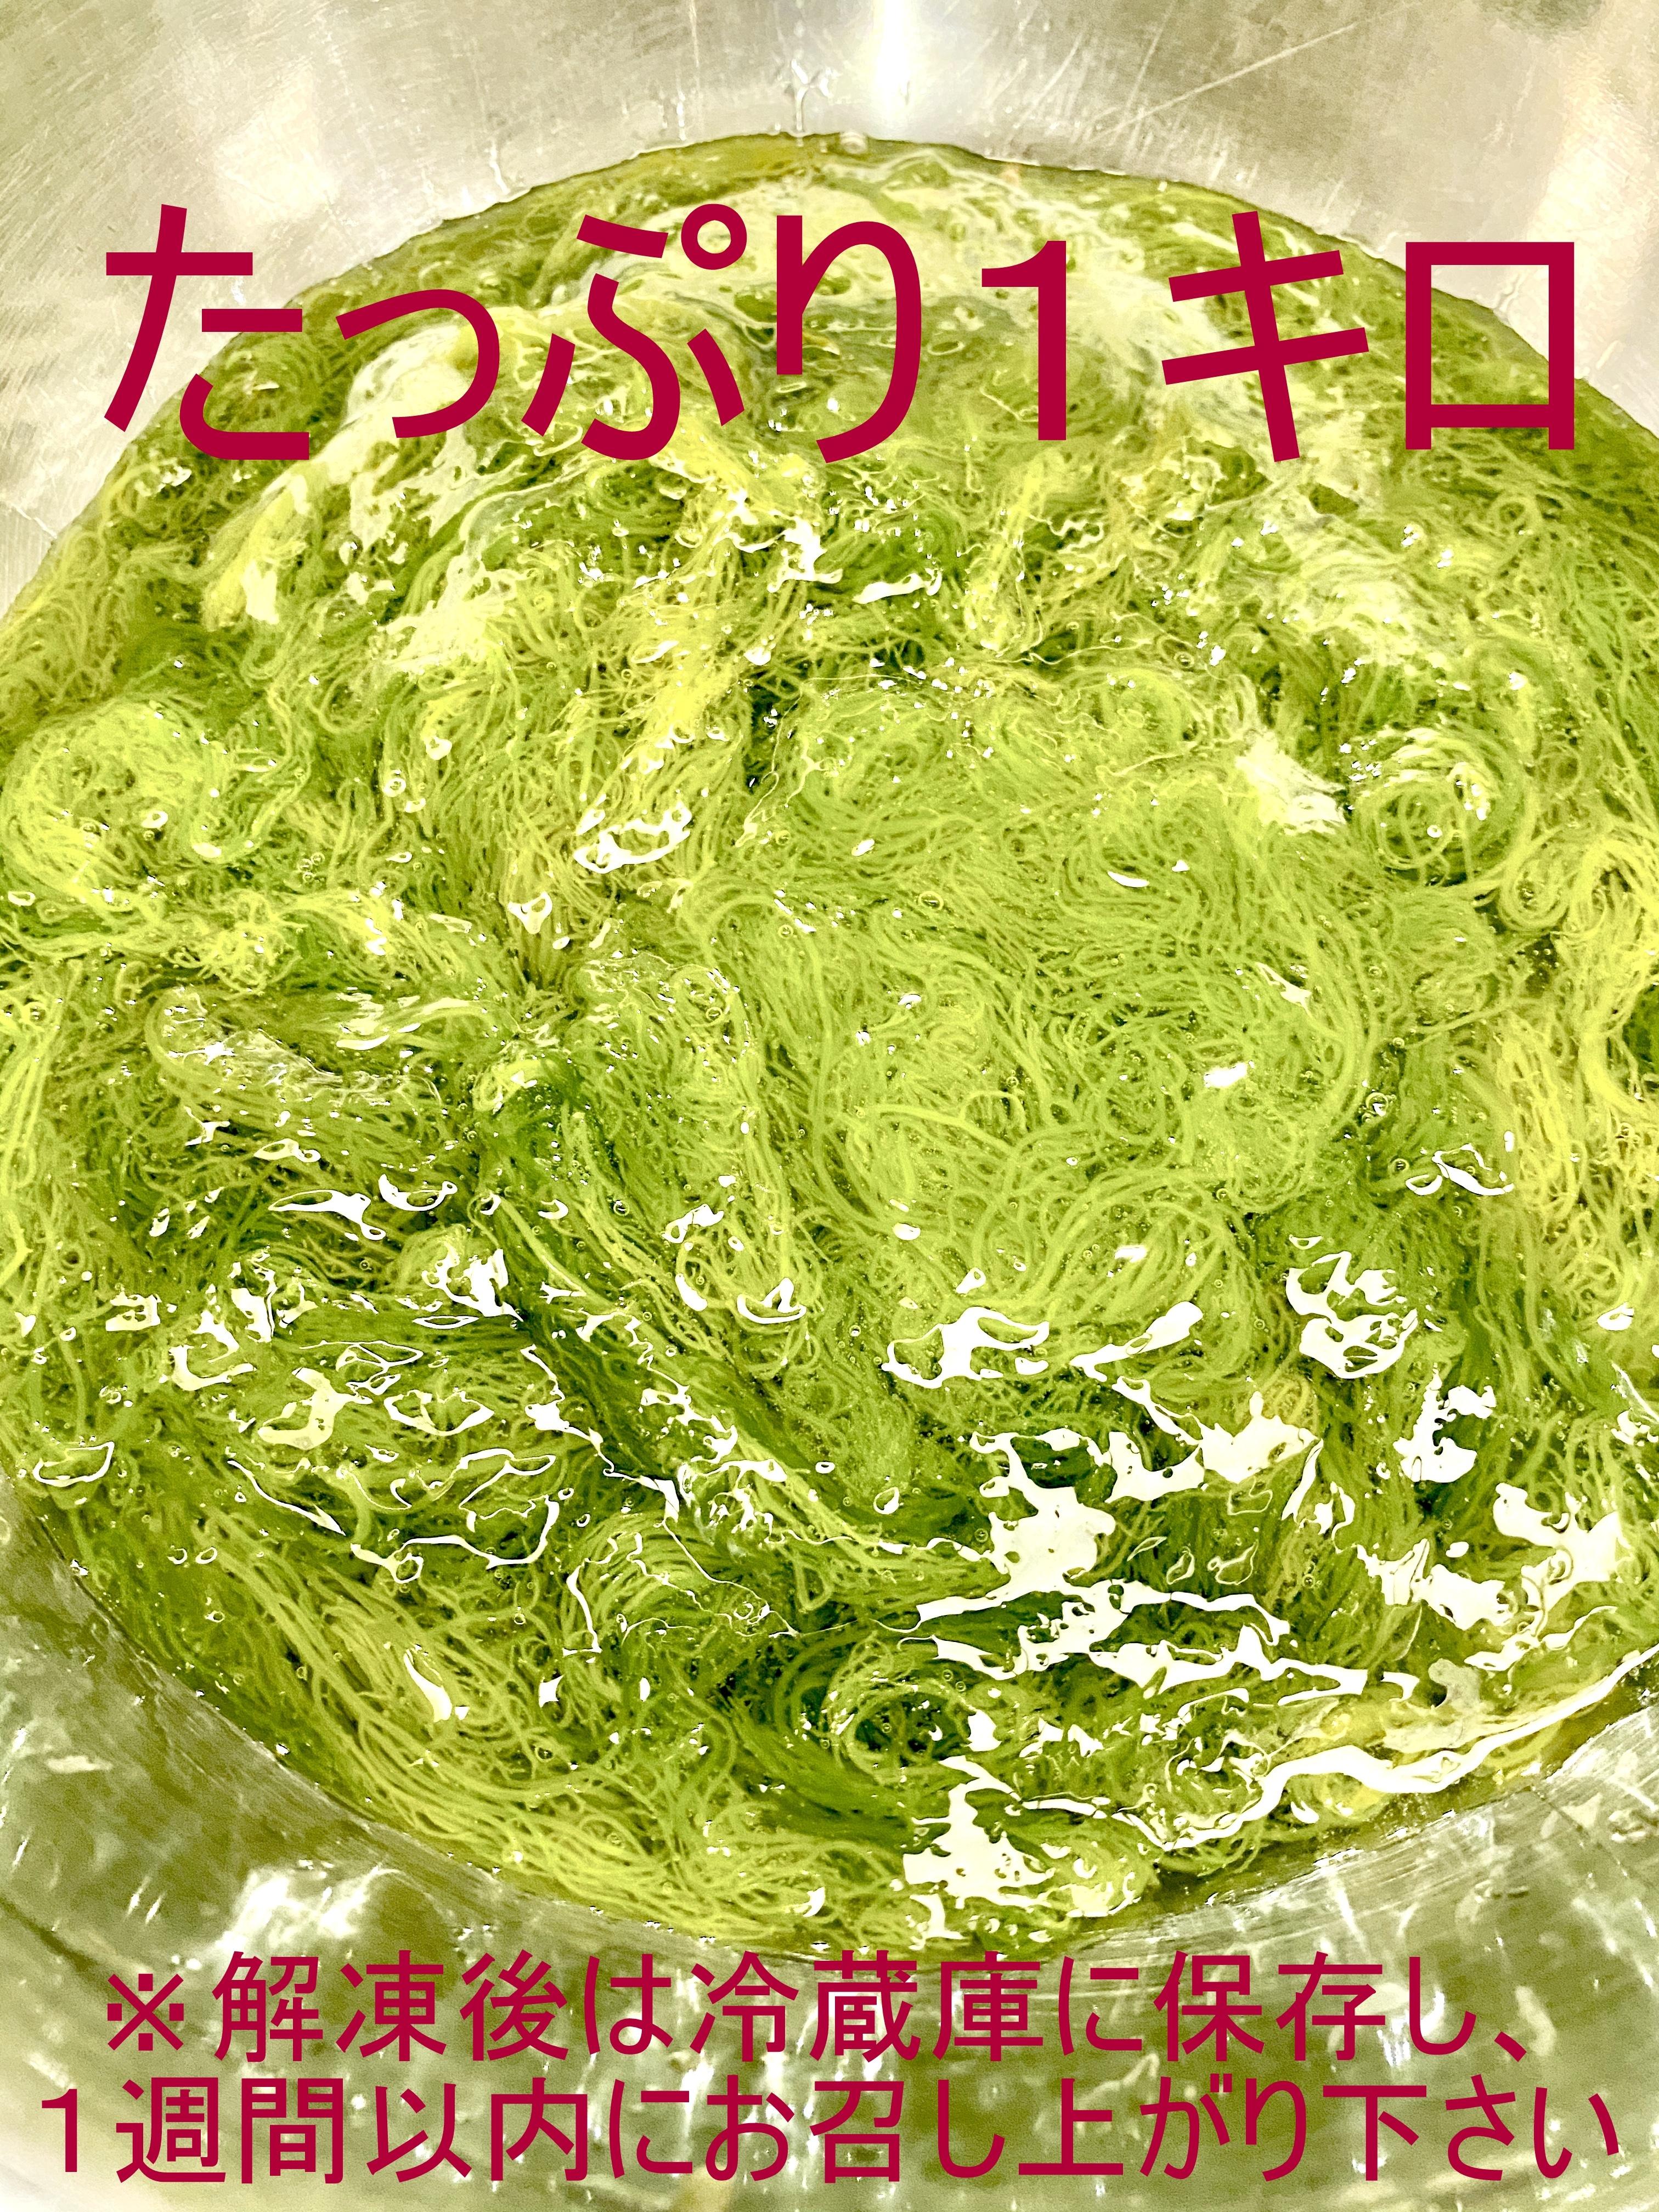 【BASE開設1周年記念セール!】(0019)衝撃の食感!フコイダン!青森産冷凍【稀少な天然物】花もずく(白神もずく・新物) 業務用 1kg